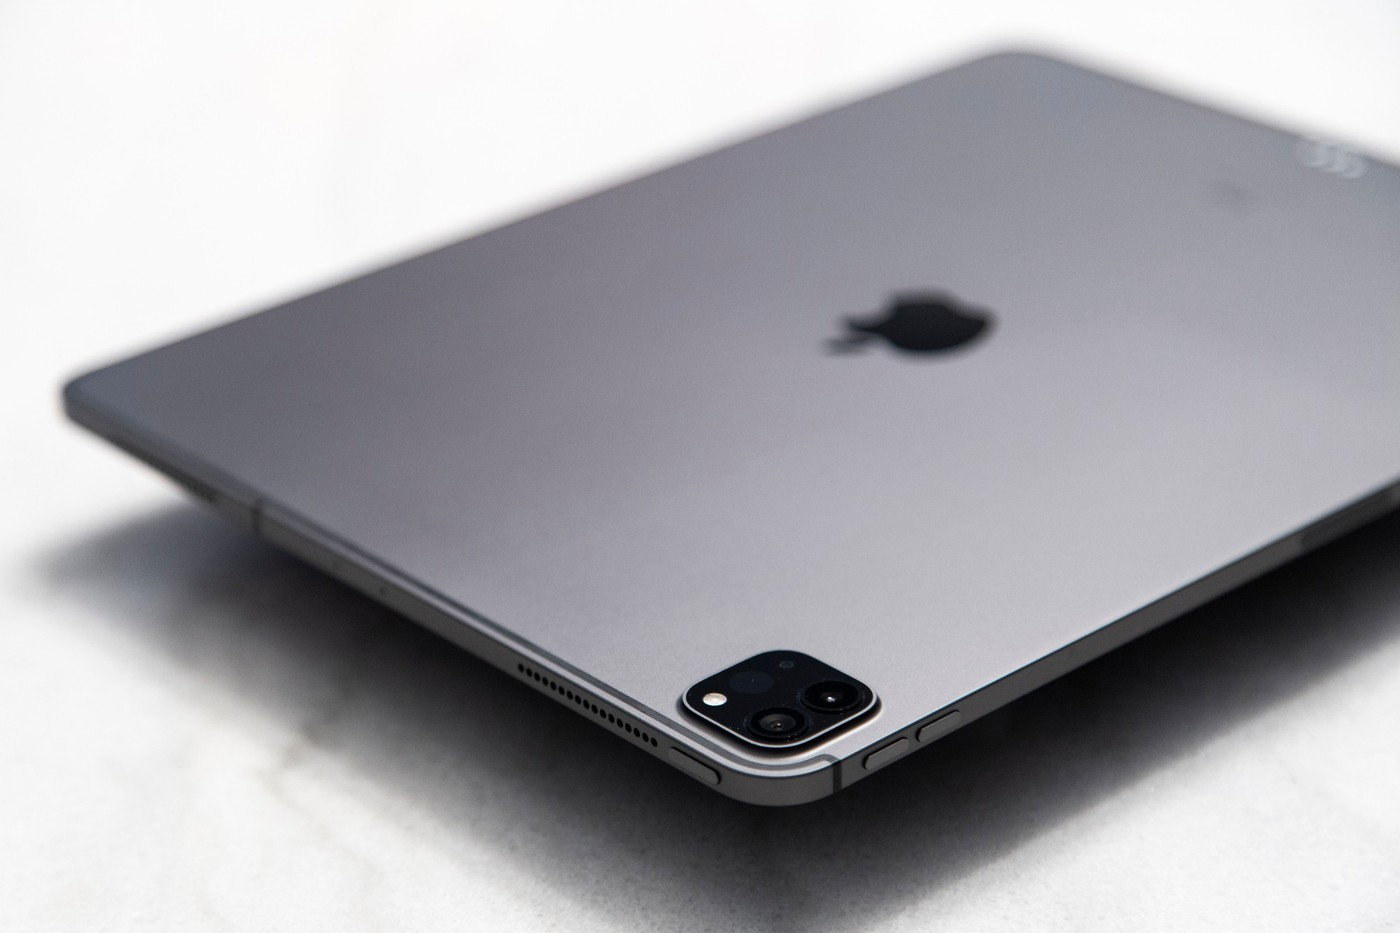 Apple iPhone 12 design 2020 iPad Pro